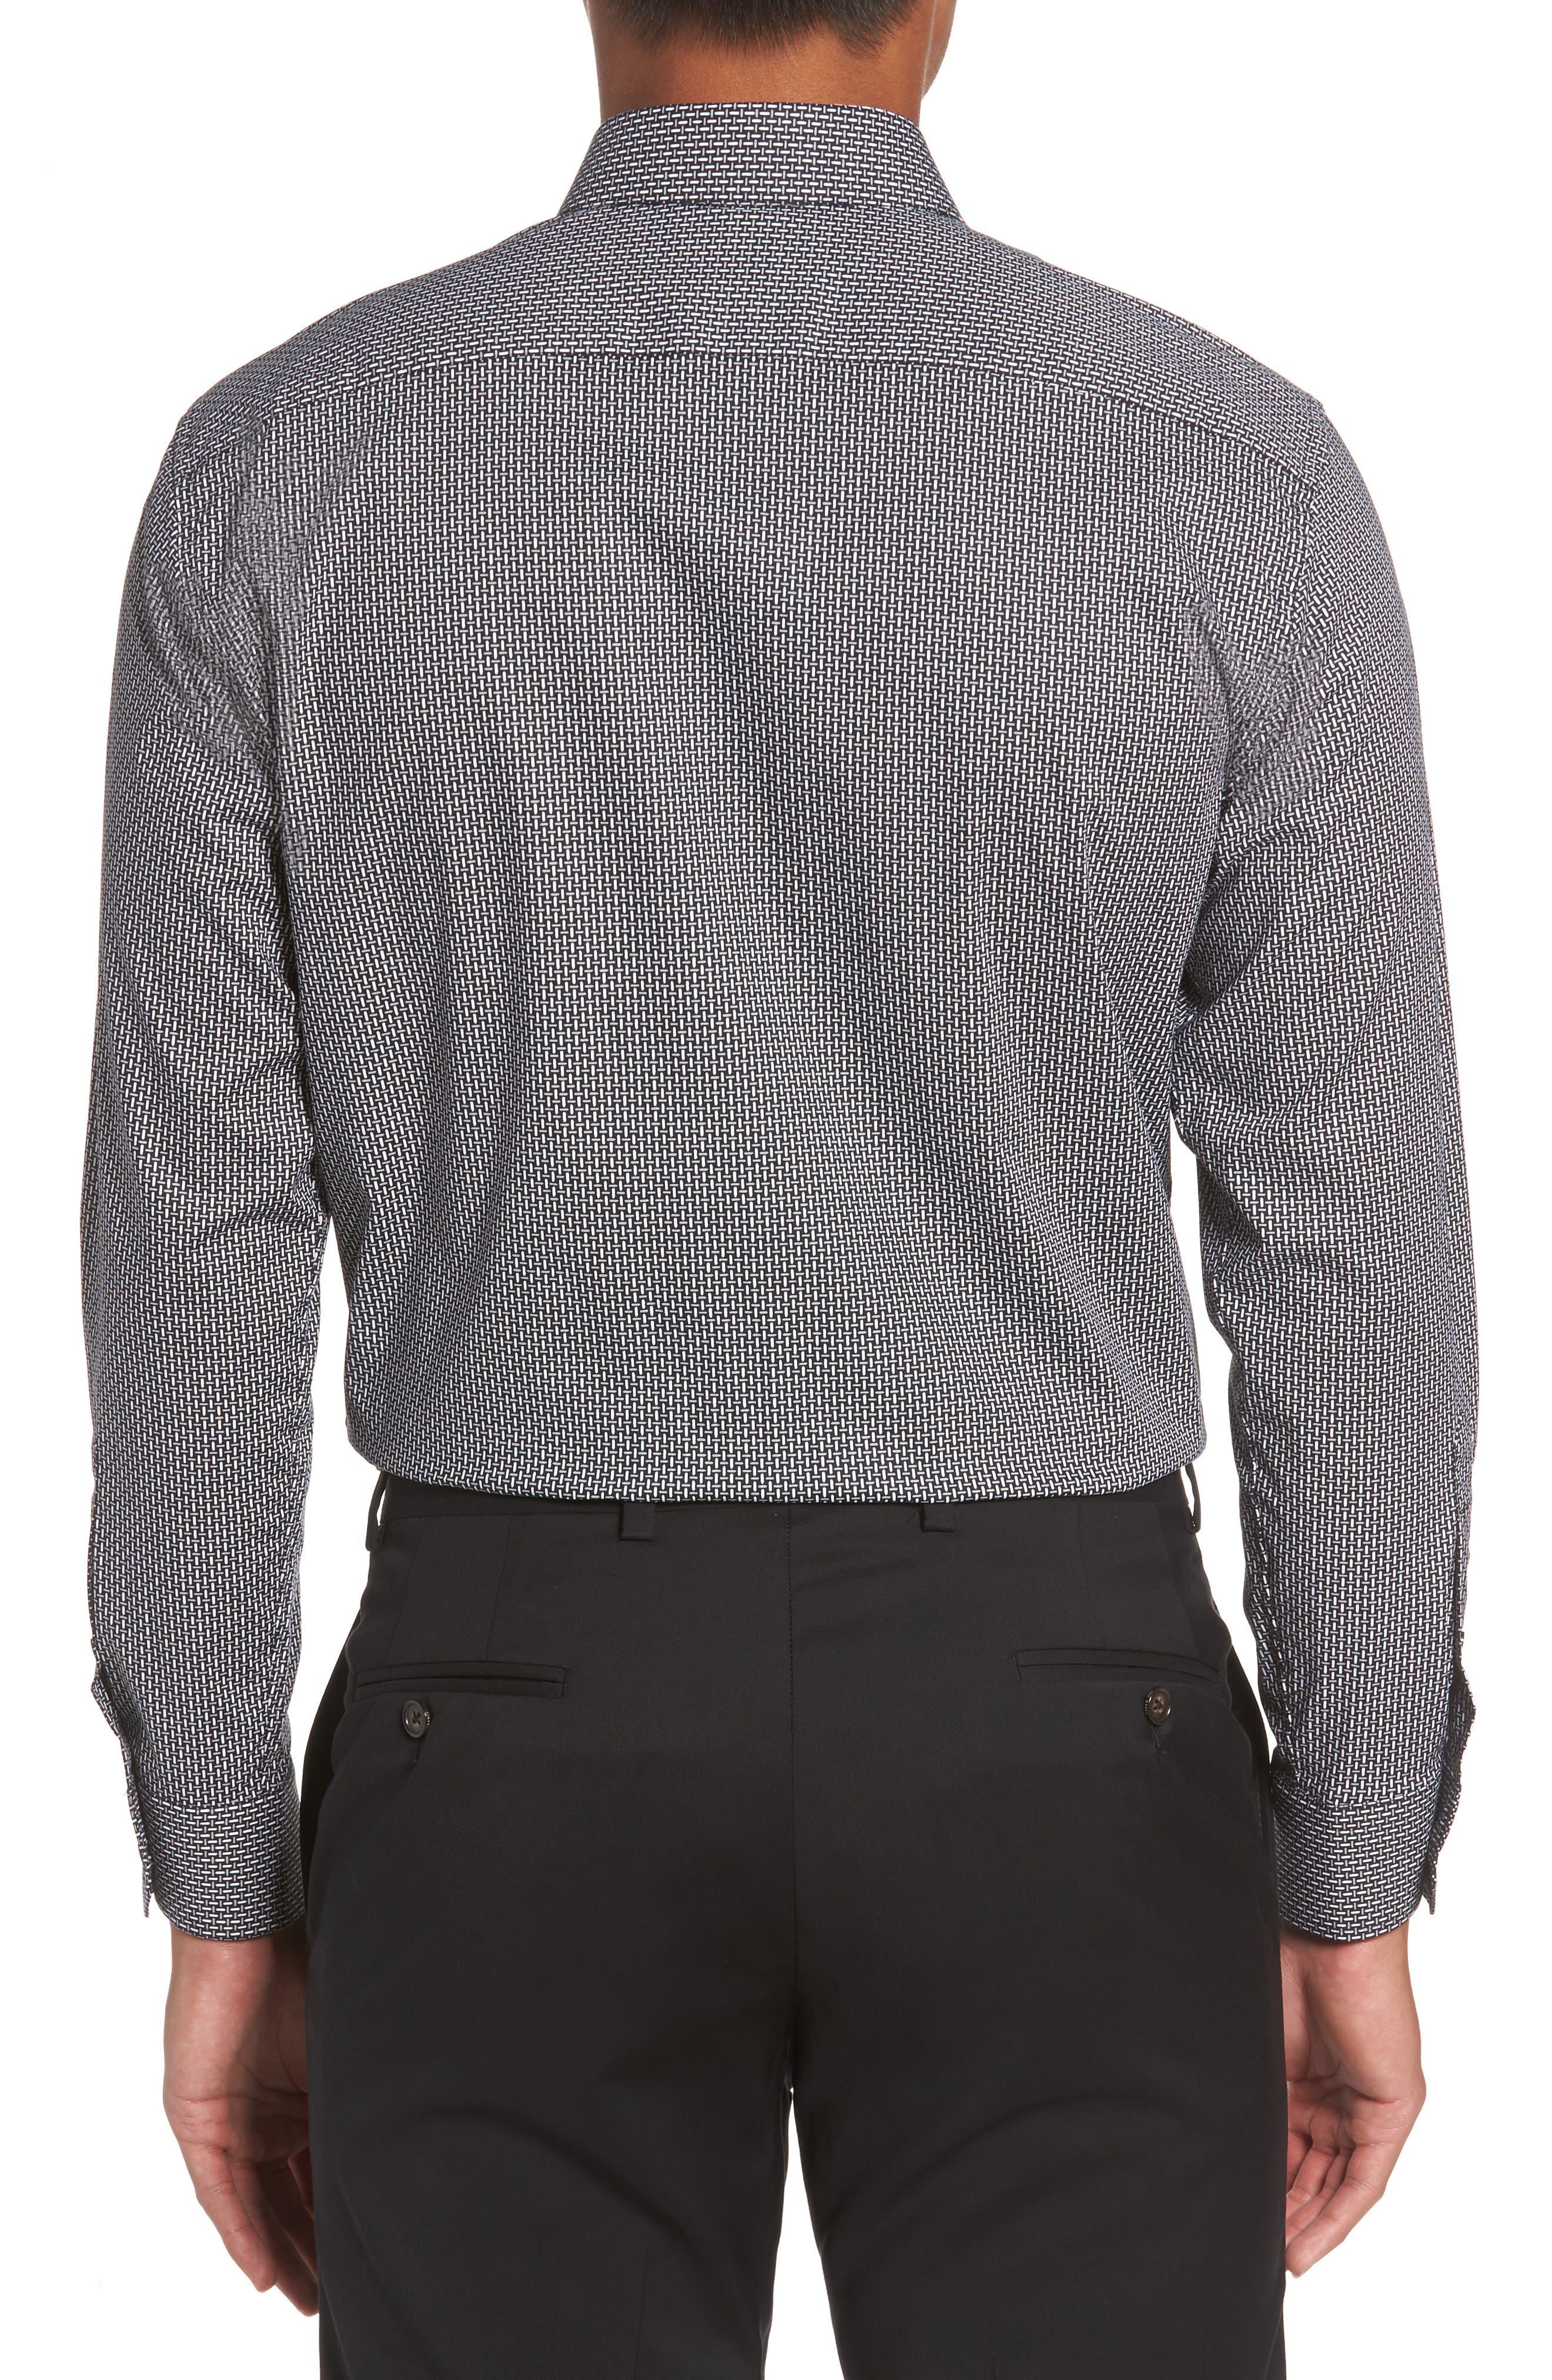 Alternate Image 3  - Calibrate Trim Fit Non-Iron Graphic Stretch Dress Shirt